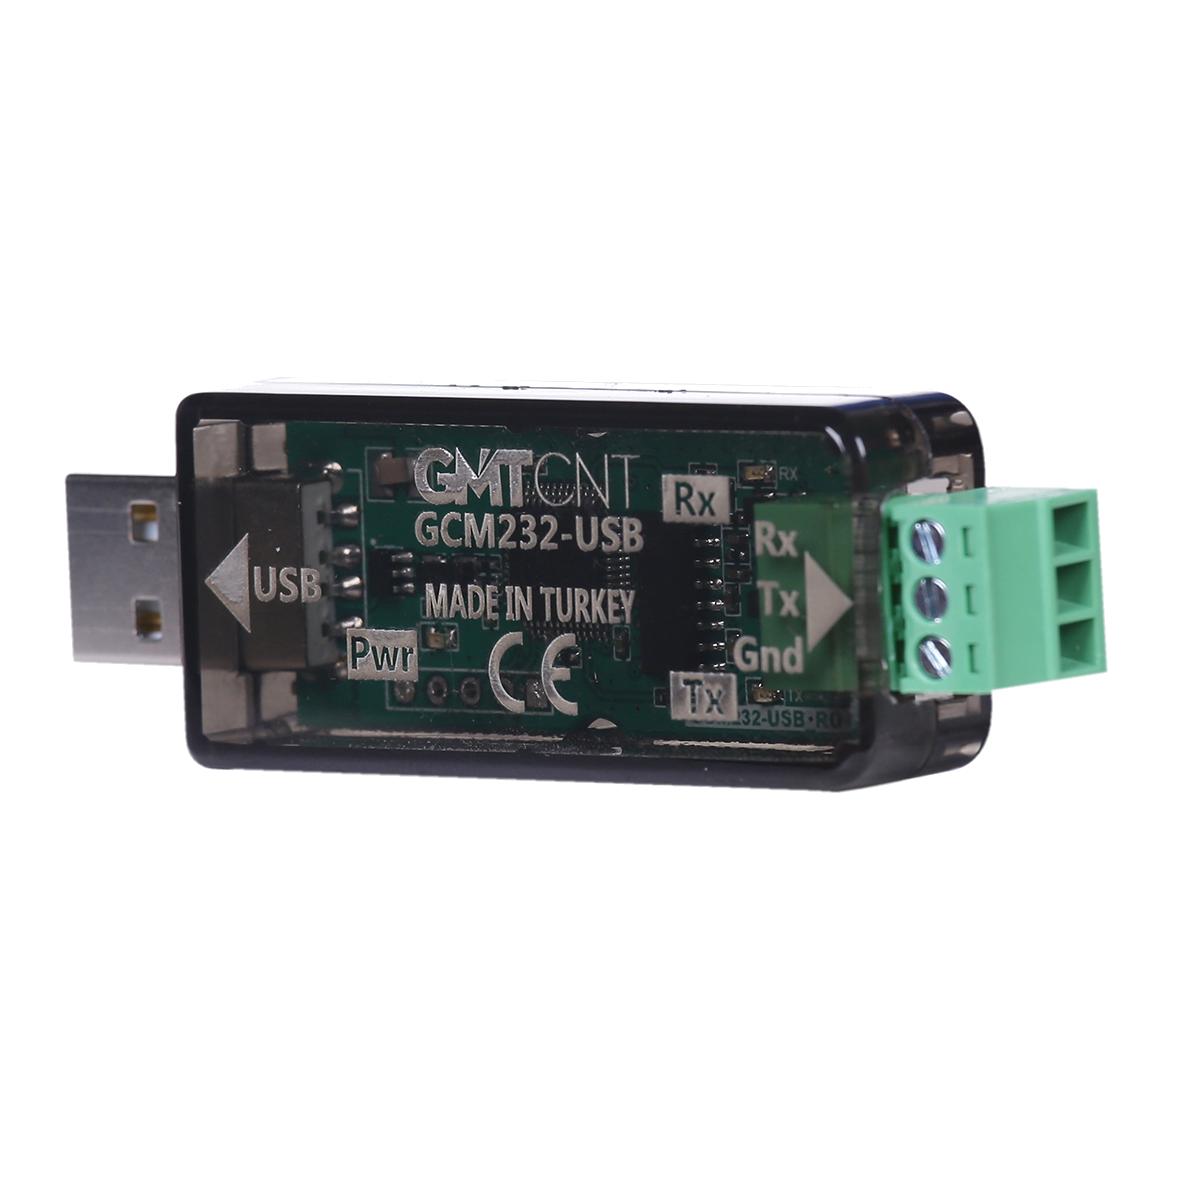 GCM232-USB